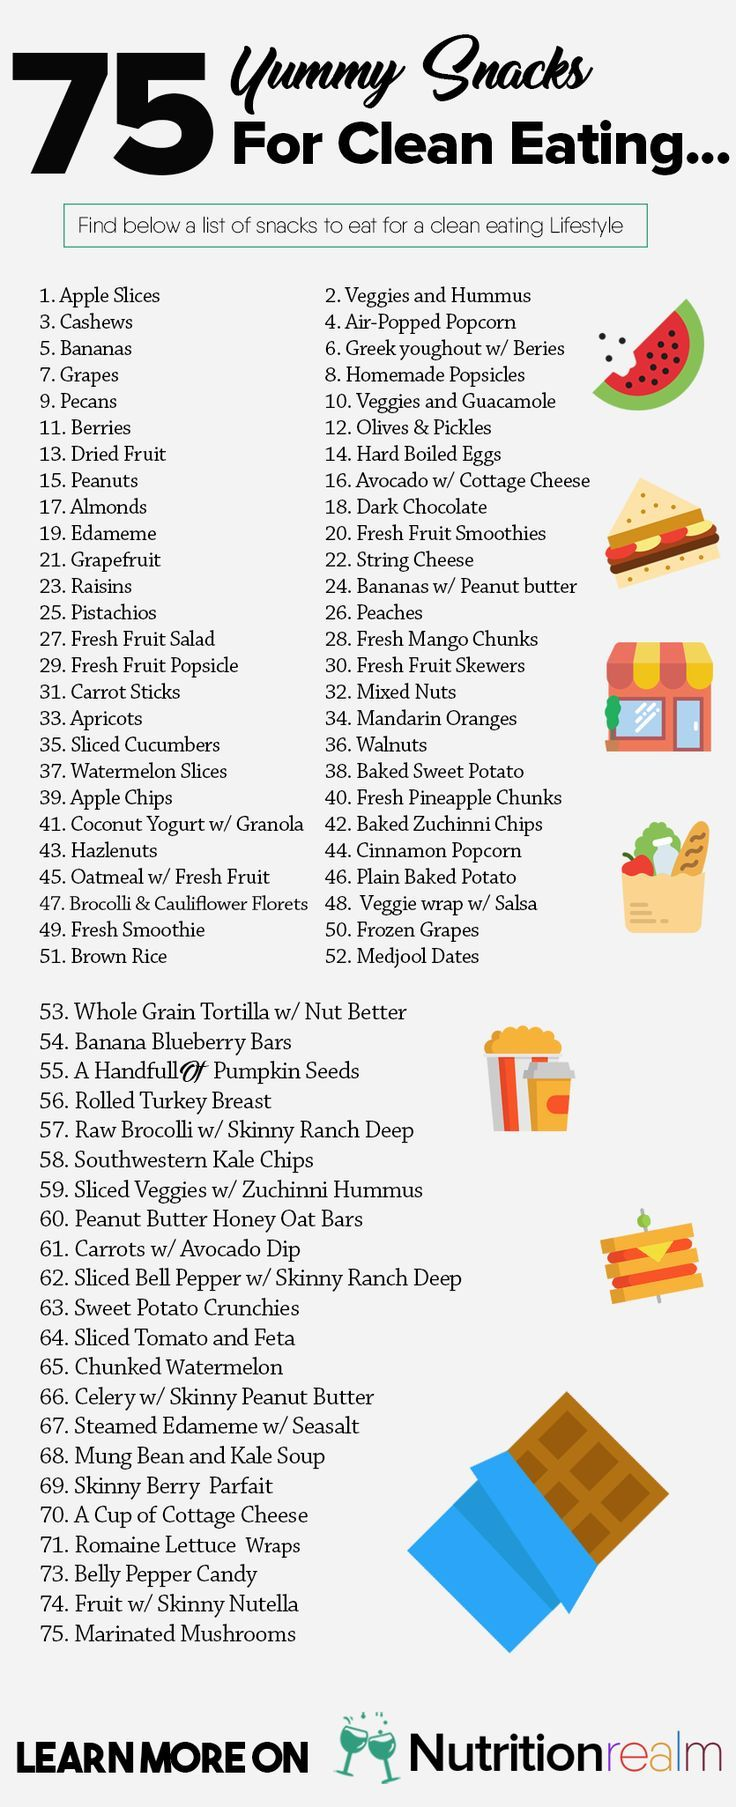 Does Insanity Diet Plan Work